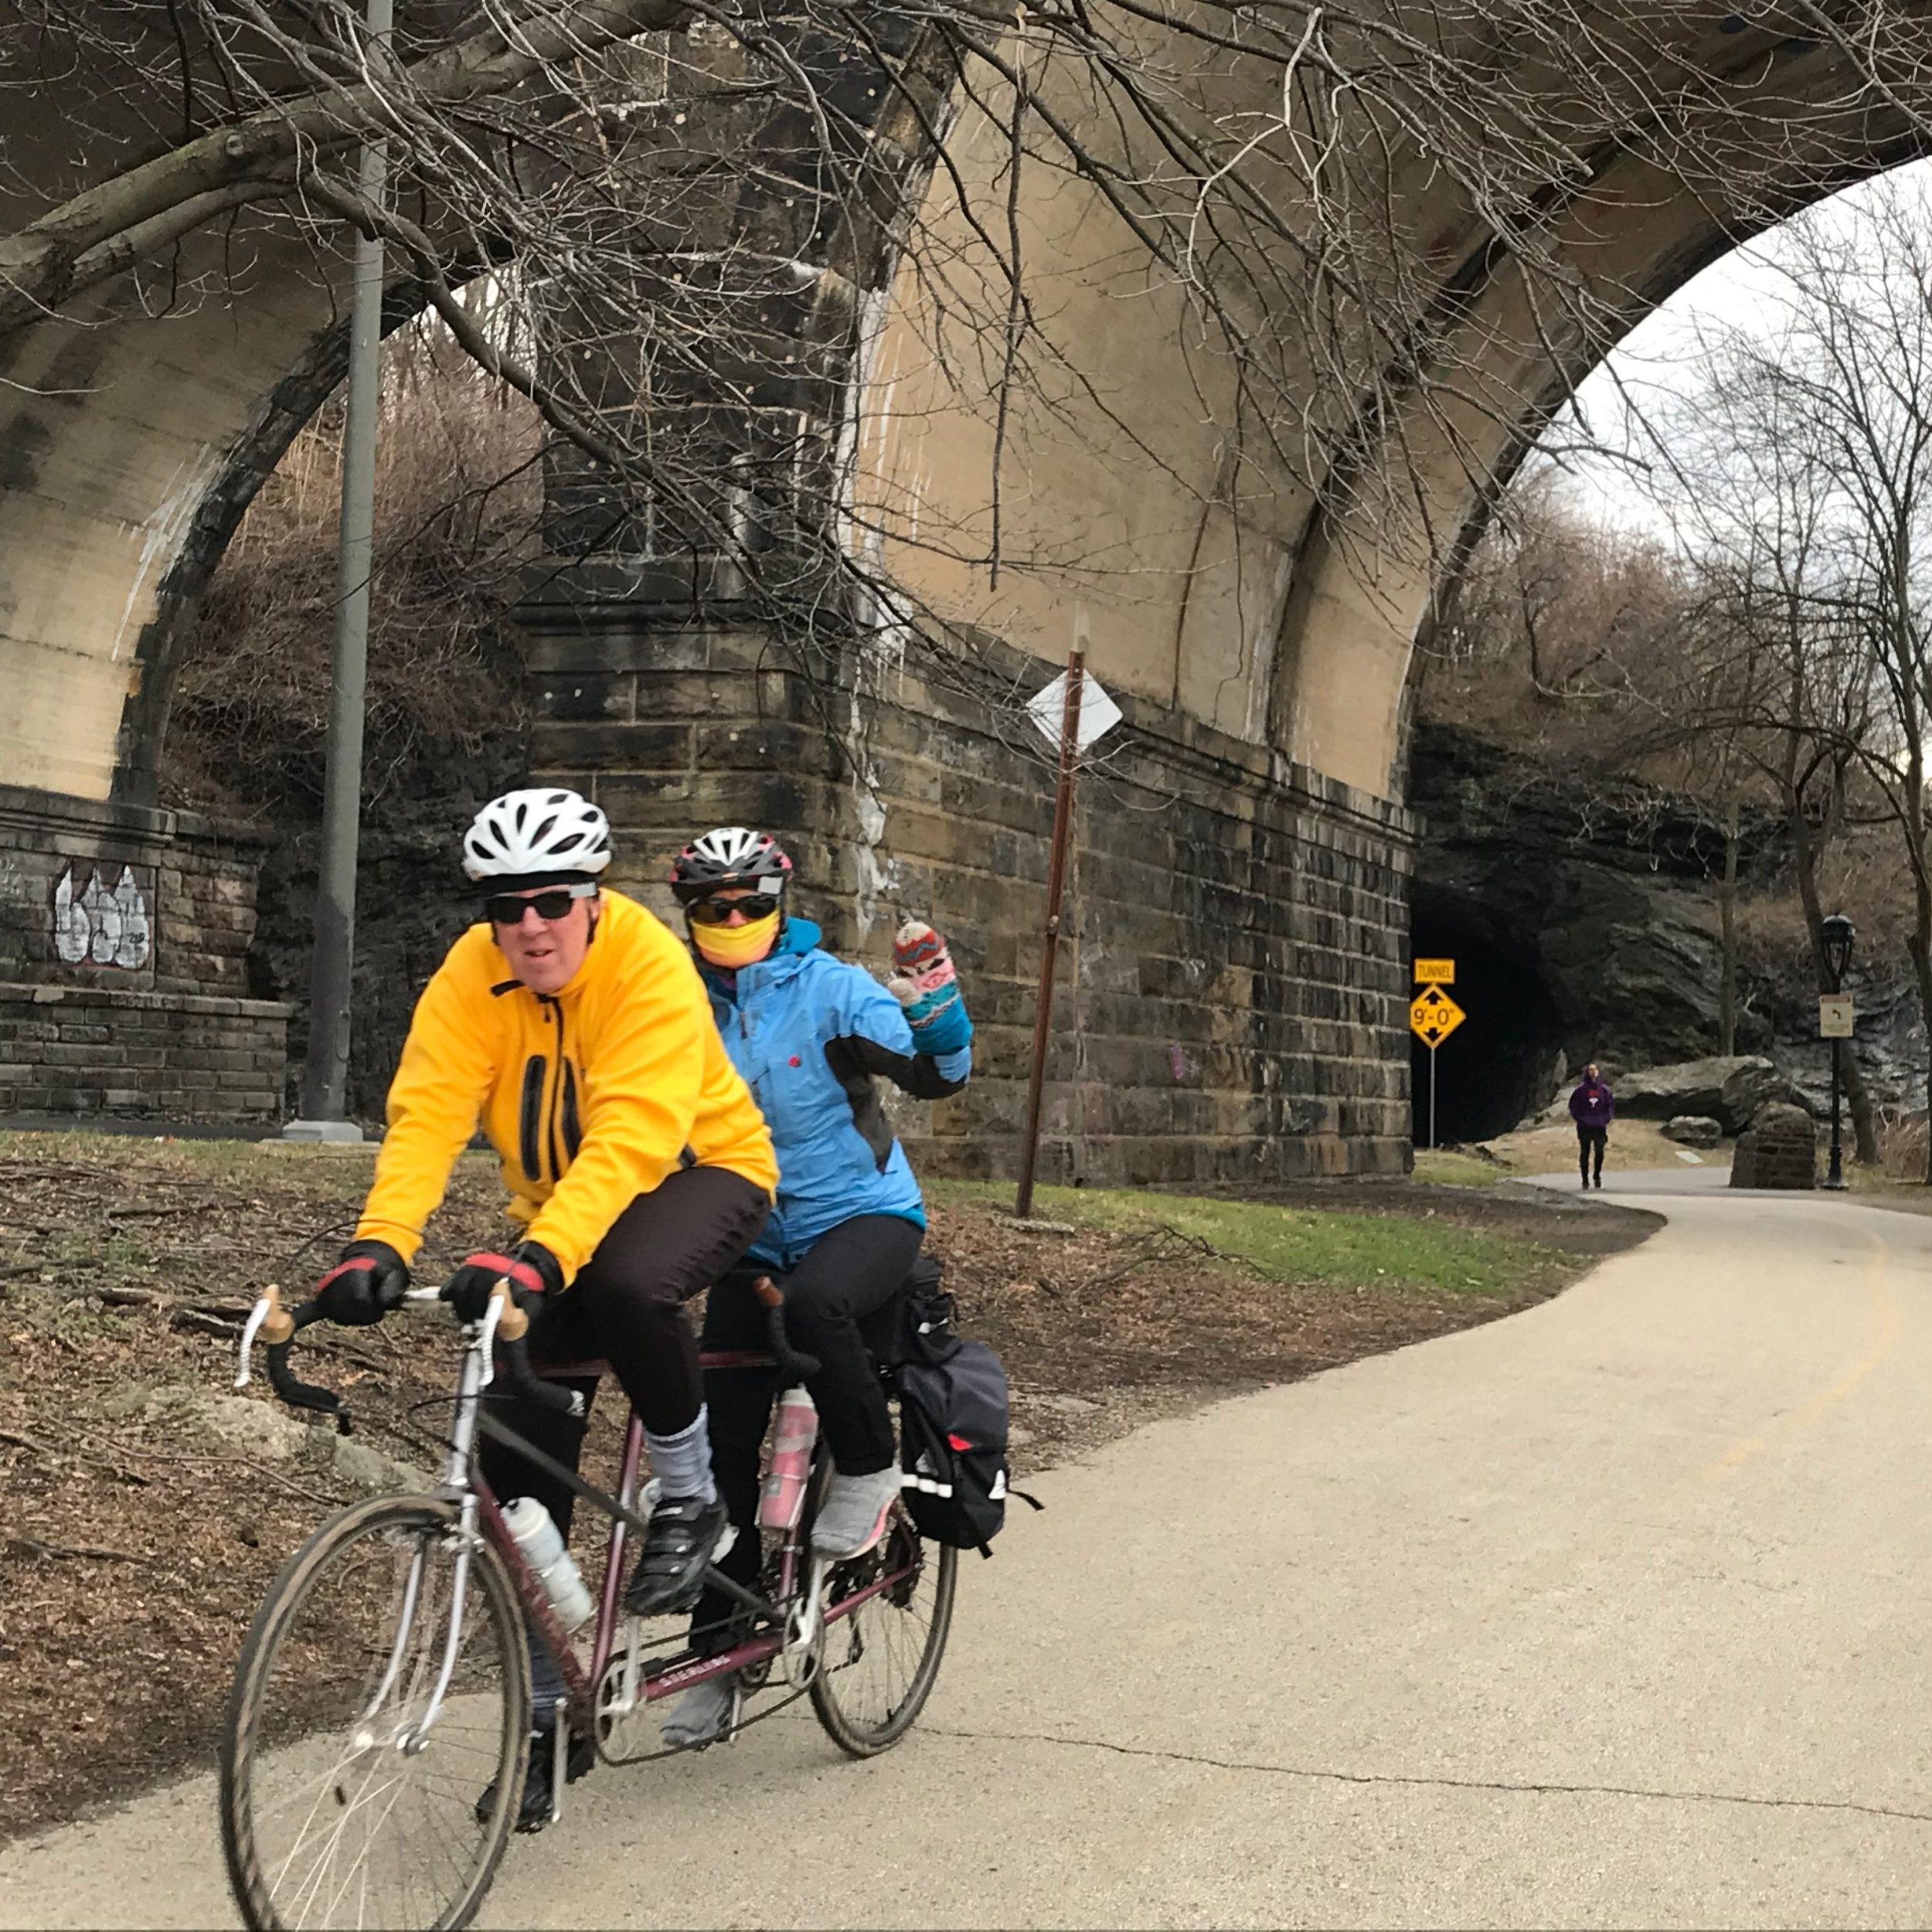 Tandem Bike on the Schuylkill River Trail